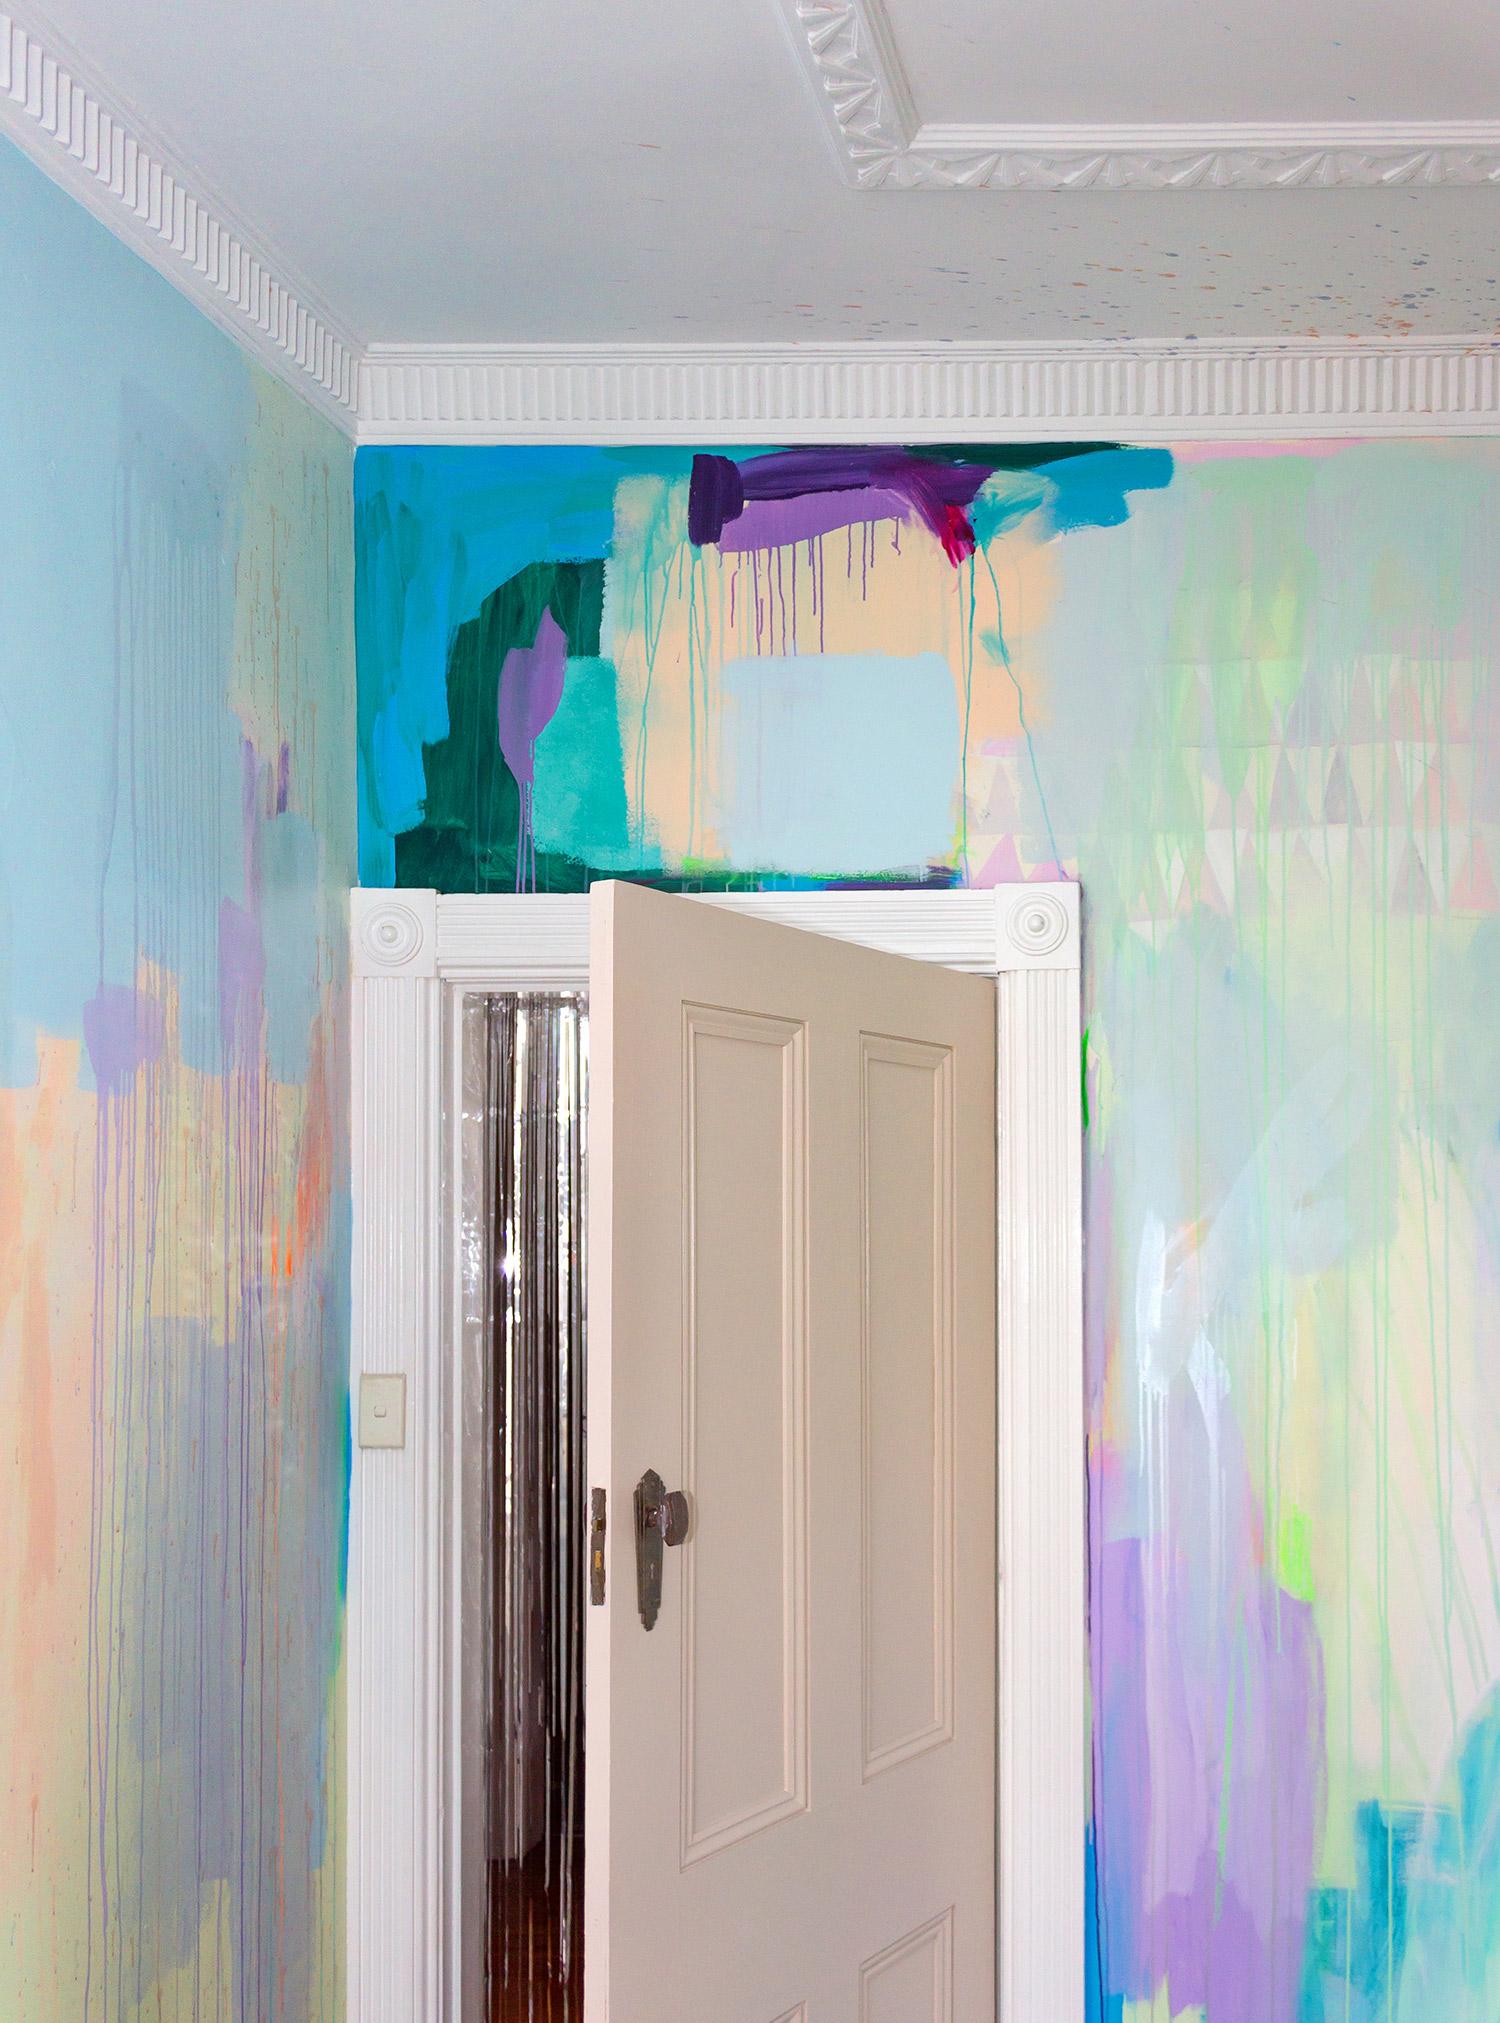 mural-pastel-magical-child-camillejaval-01.jpg